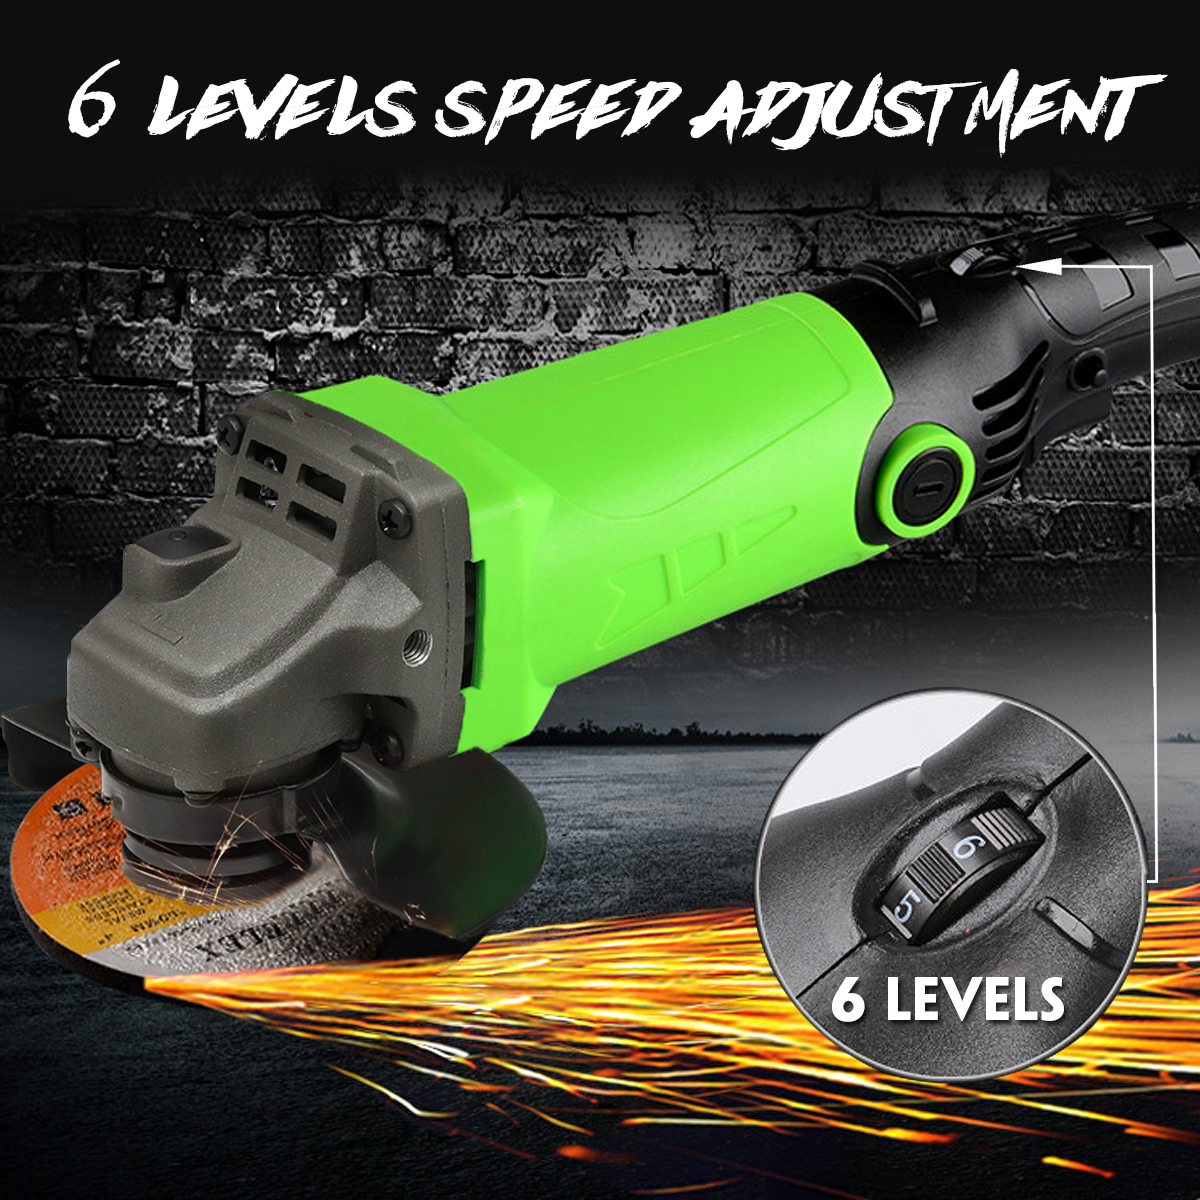 1Pcs 220V Multipurpose Angle Grinder 6 Levels Speed Adjustable Polishing Machine Grinding Drilling Tools